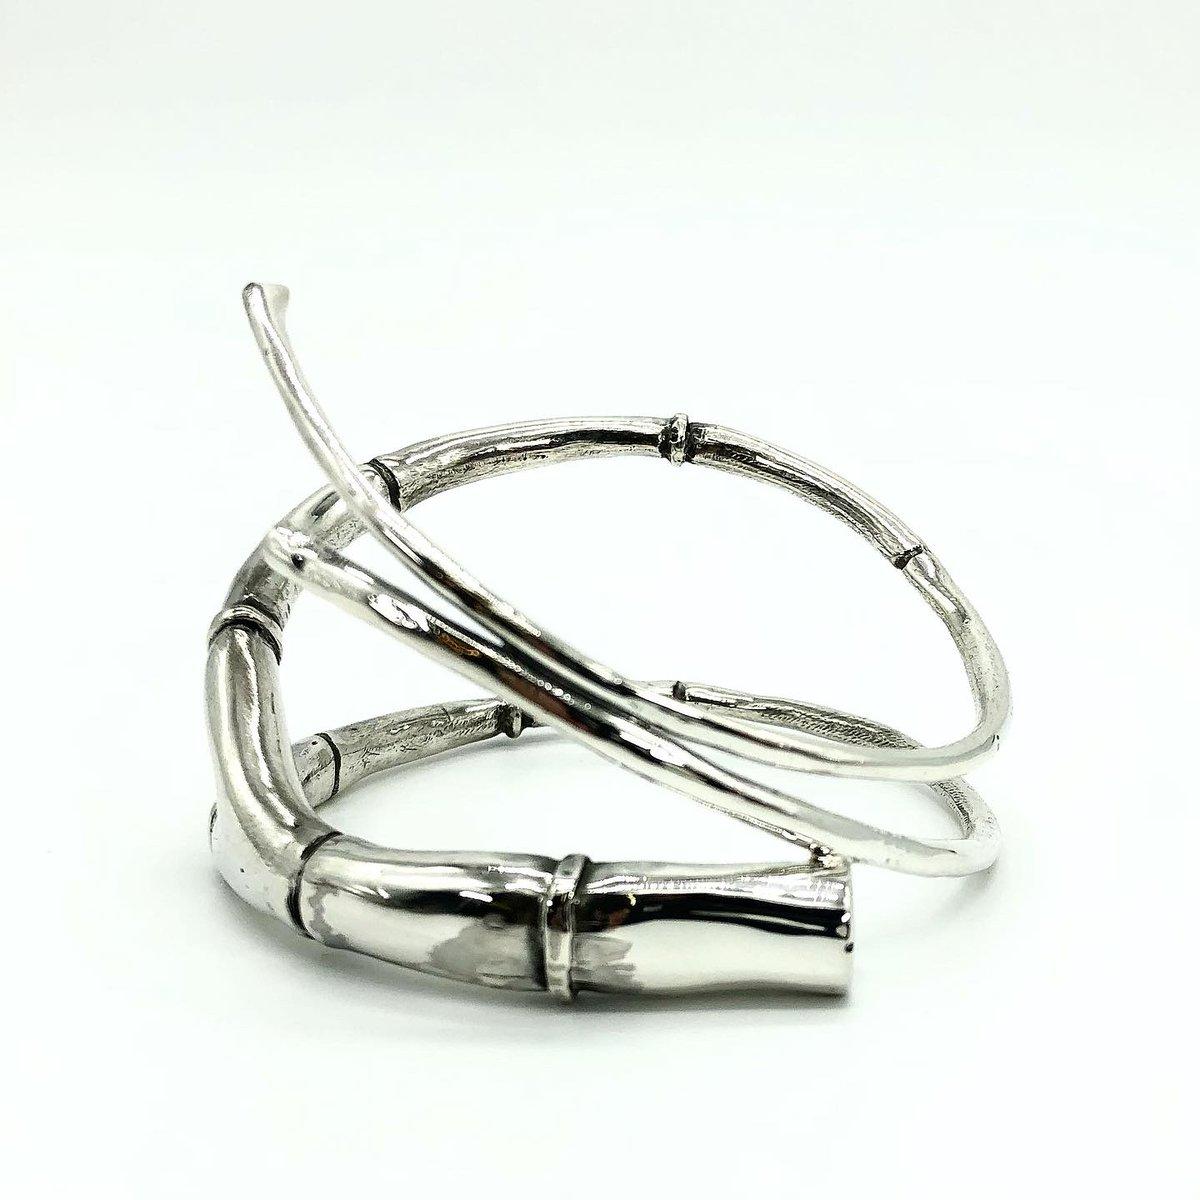 Image of Silver Branch Tendril Bangle Bracelet 01